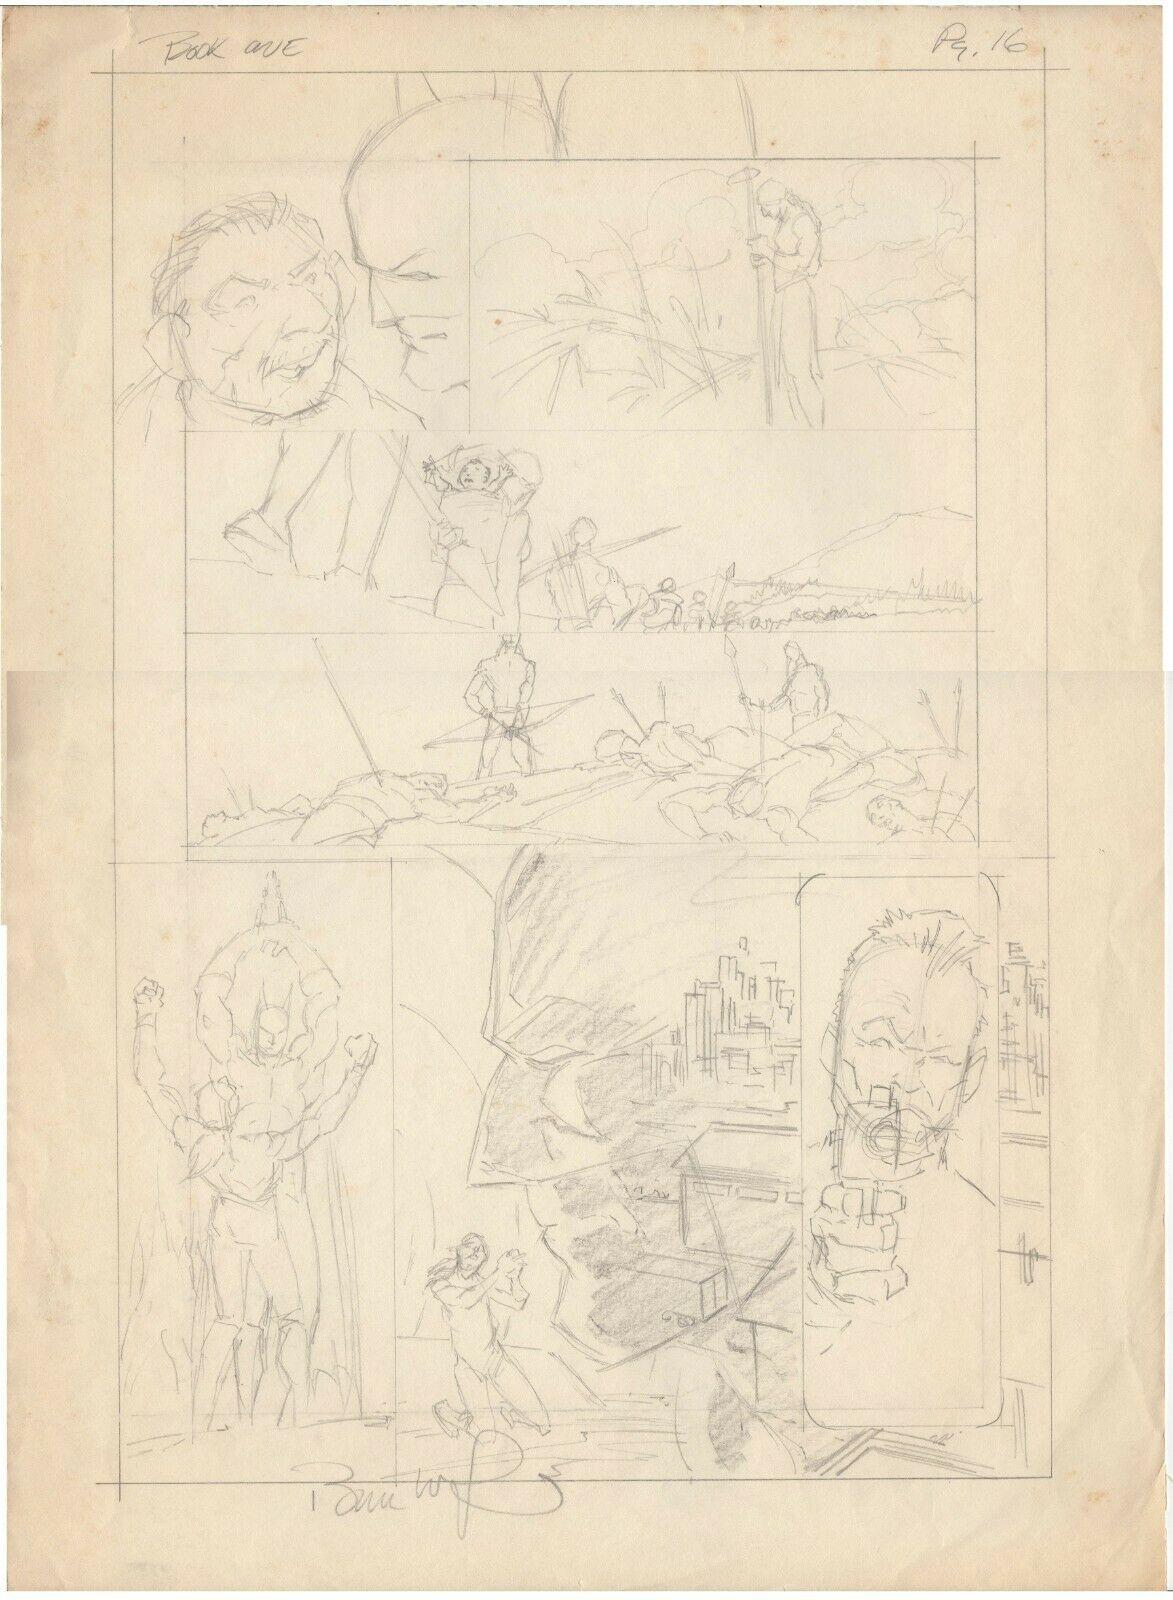 Berni Wrightson Original pencil layouts for BATMAN The Cult .